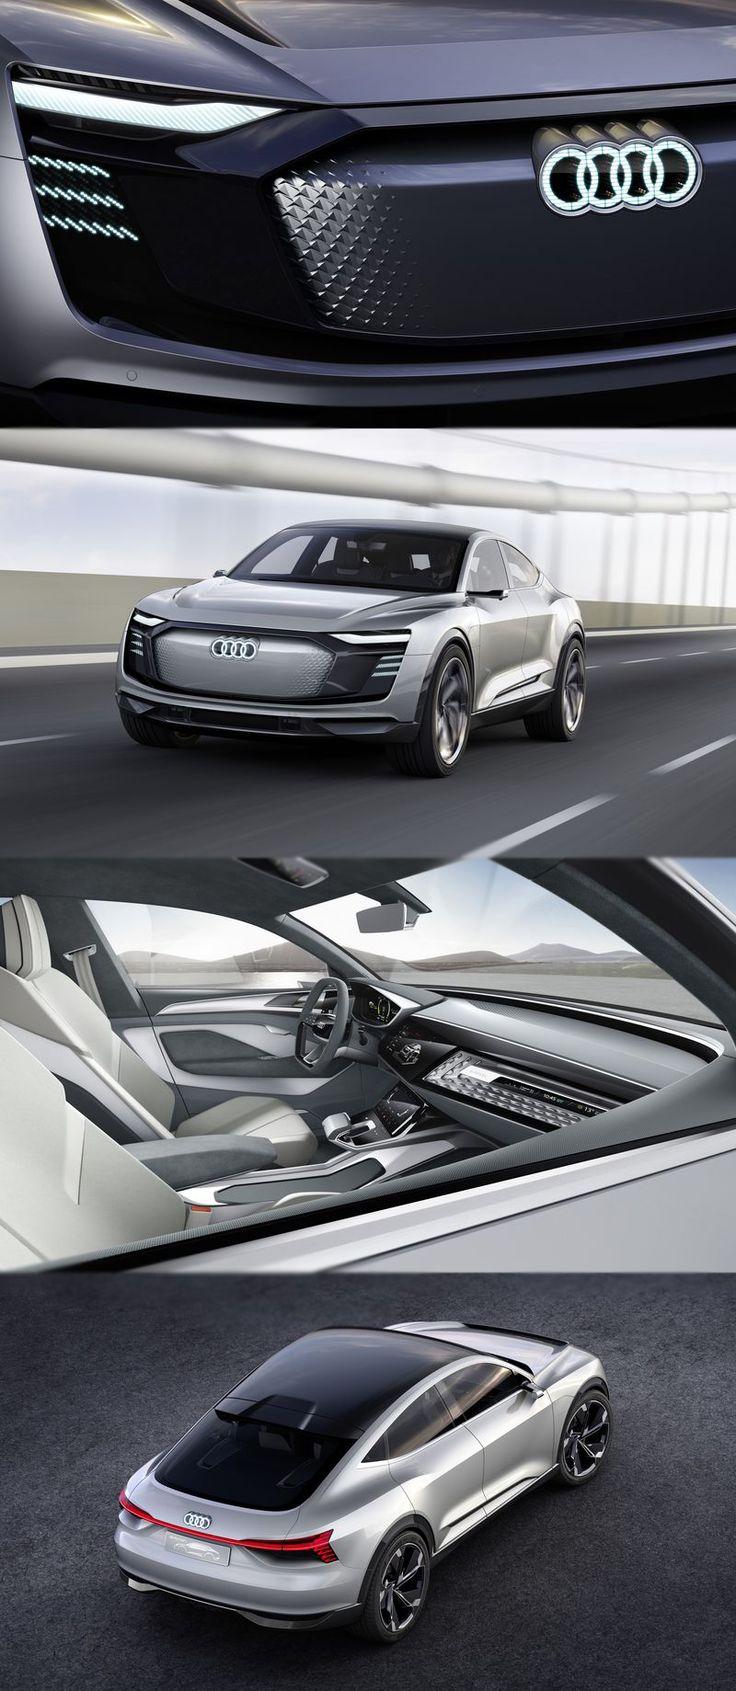 Audi s new electric car for more deatil http germancarsenginesrepairservice blogspot